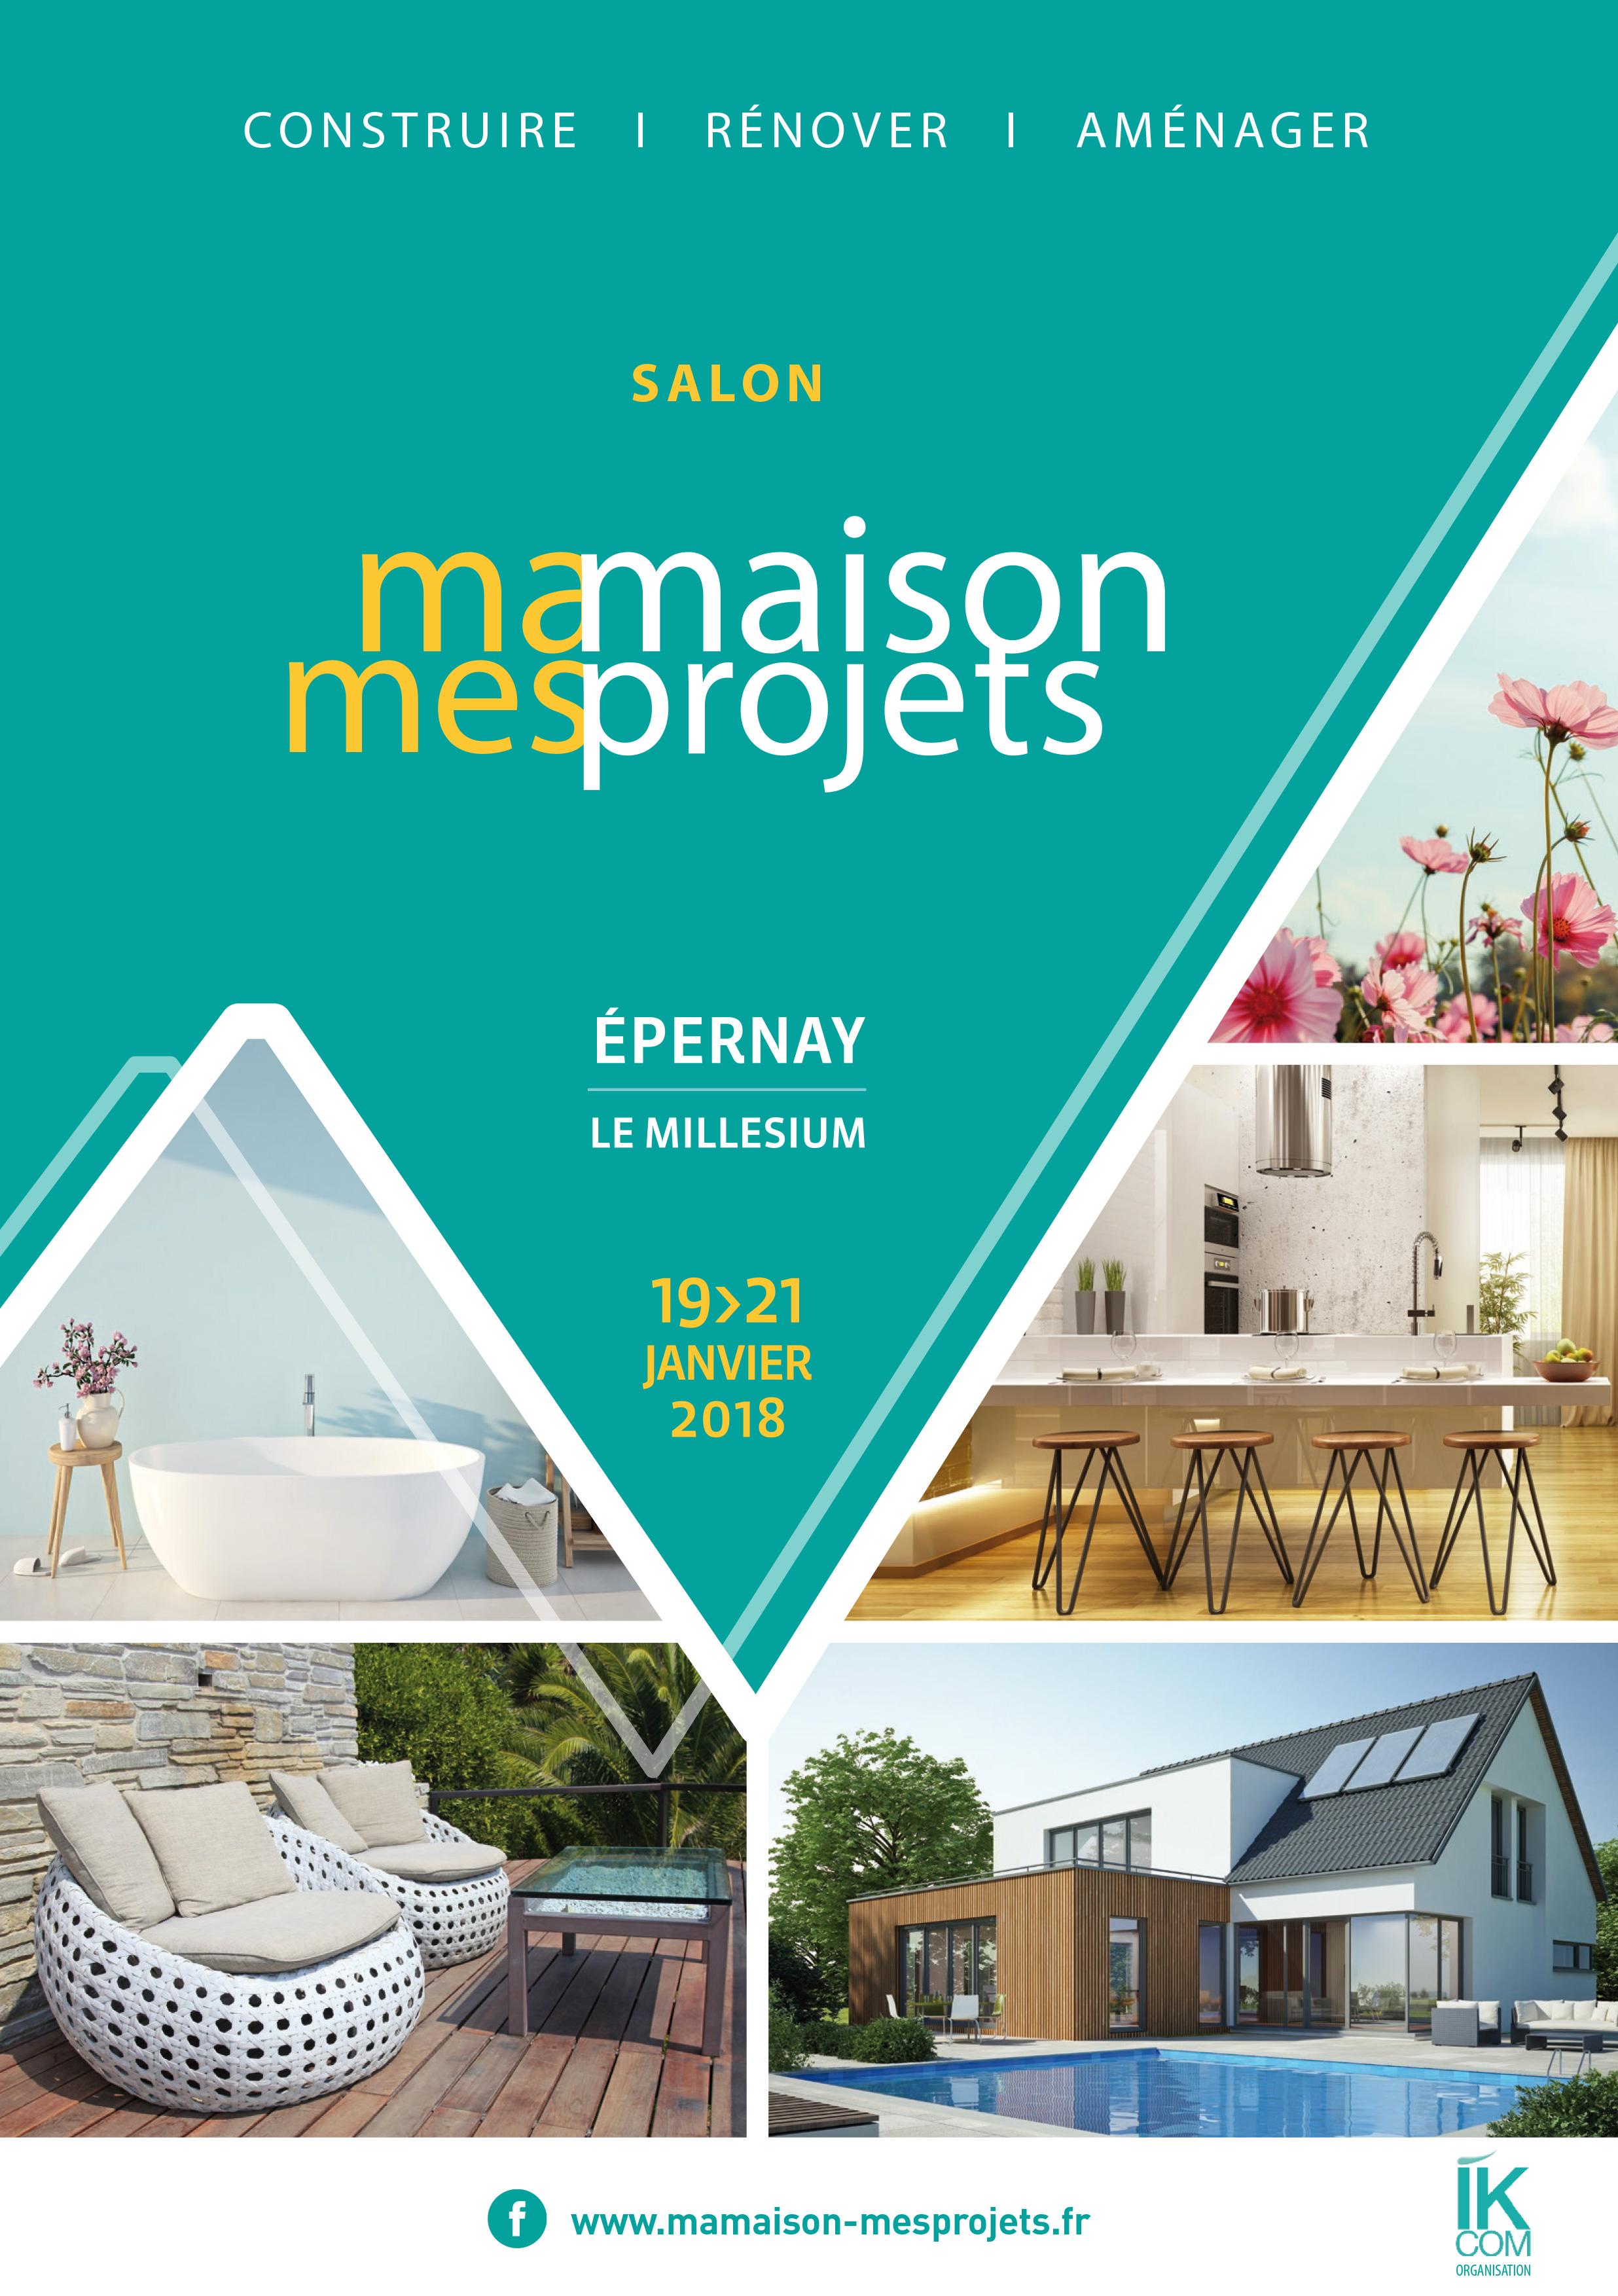 Salon habitat rénovation décoration jardin Epernay Charleville-Mézières. Construire sa maison, concrétiser ses projets. Salon ma maison mes projets.